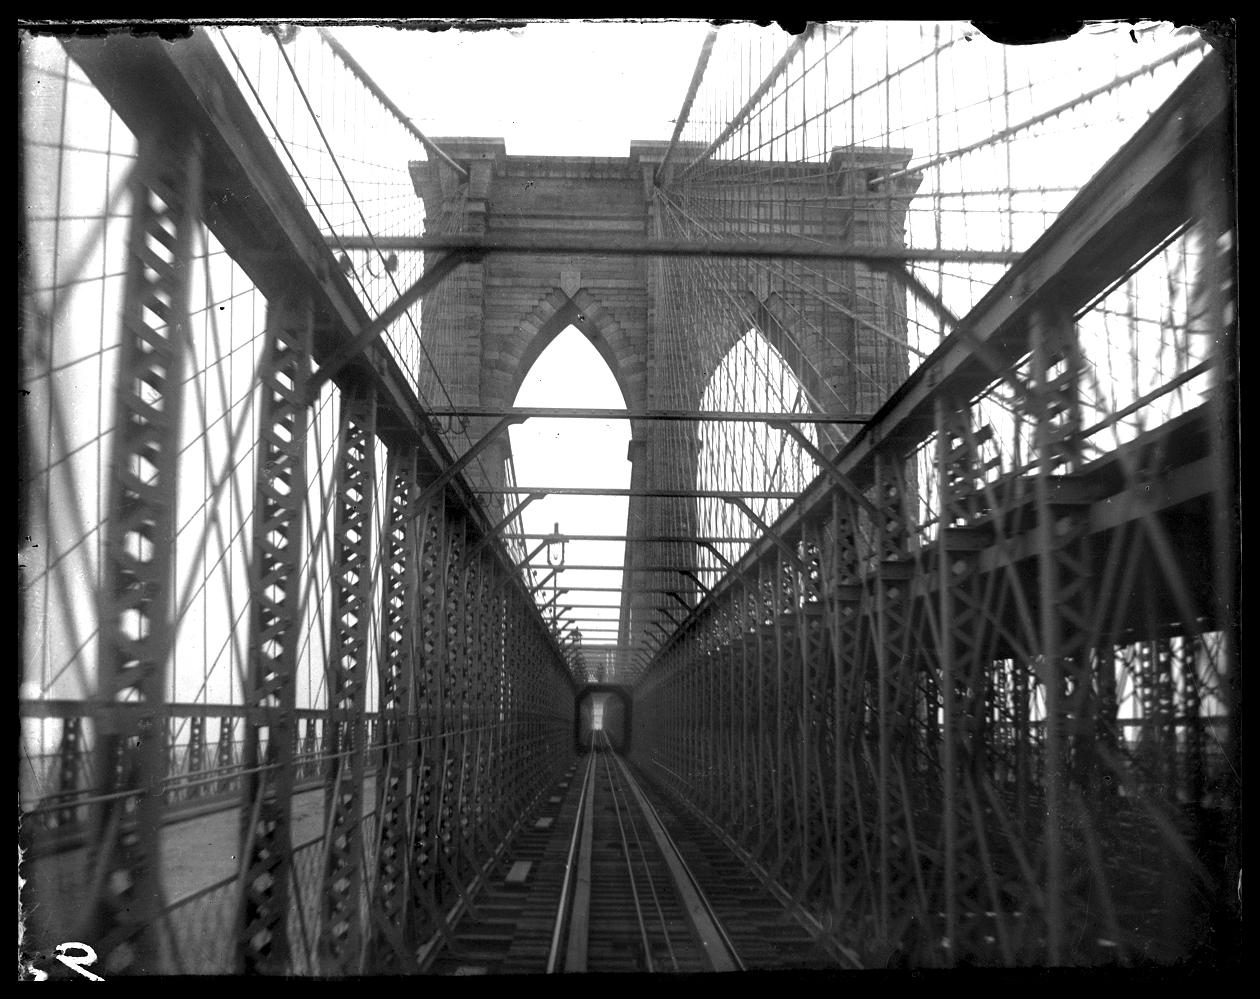 BrooklynBridgeEarlyWebcopy.jpg